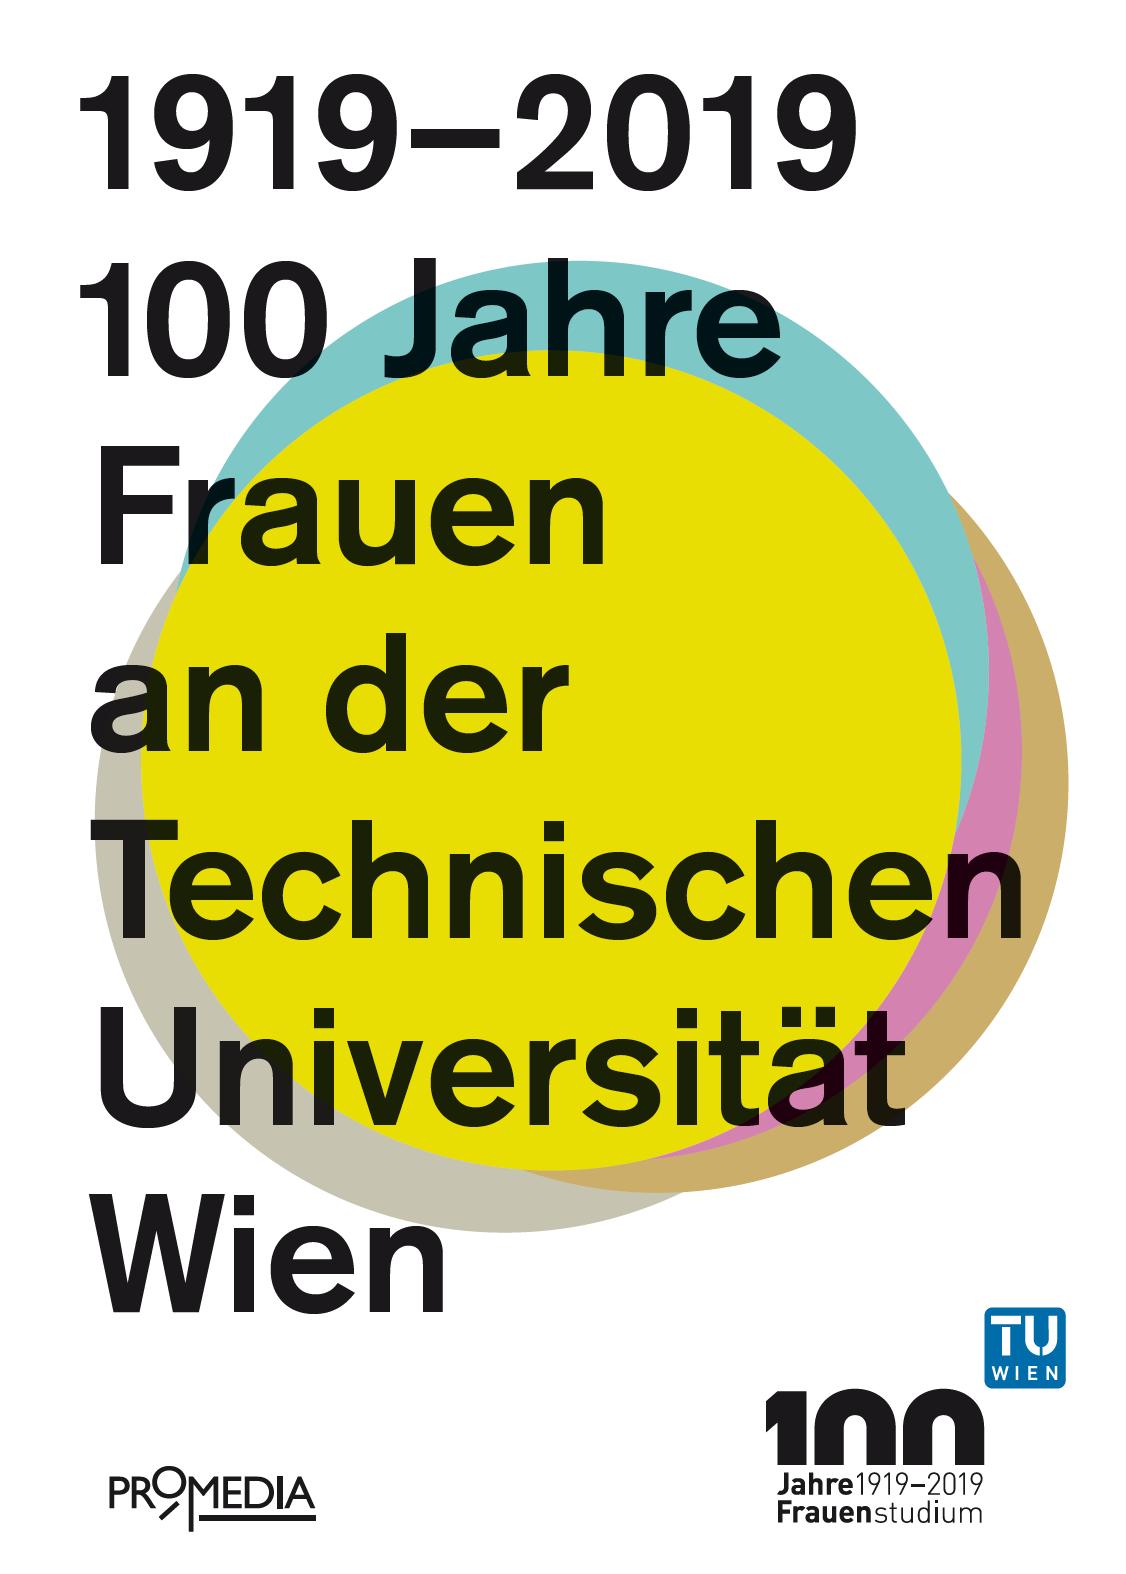 100 jahre technikstudium_buch_cover_wesearch_TU wien